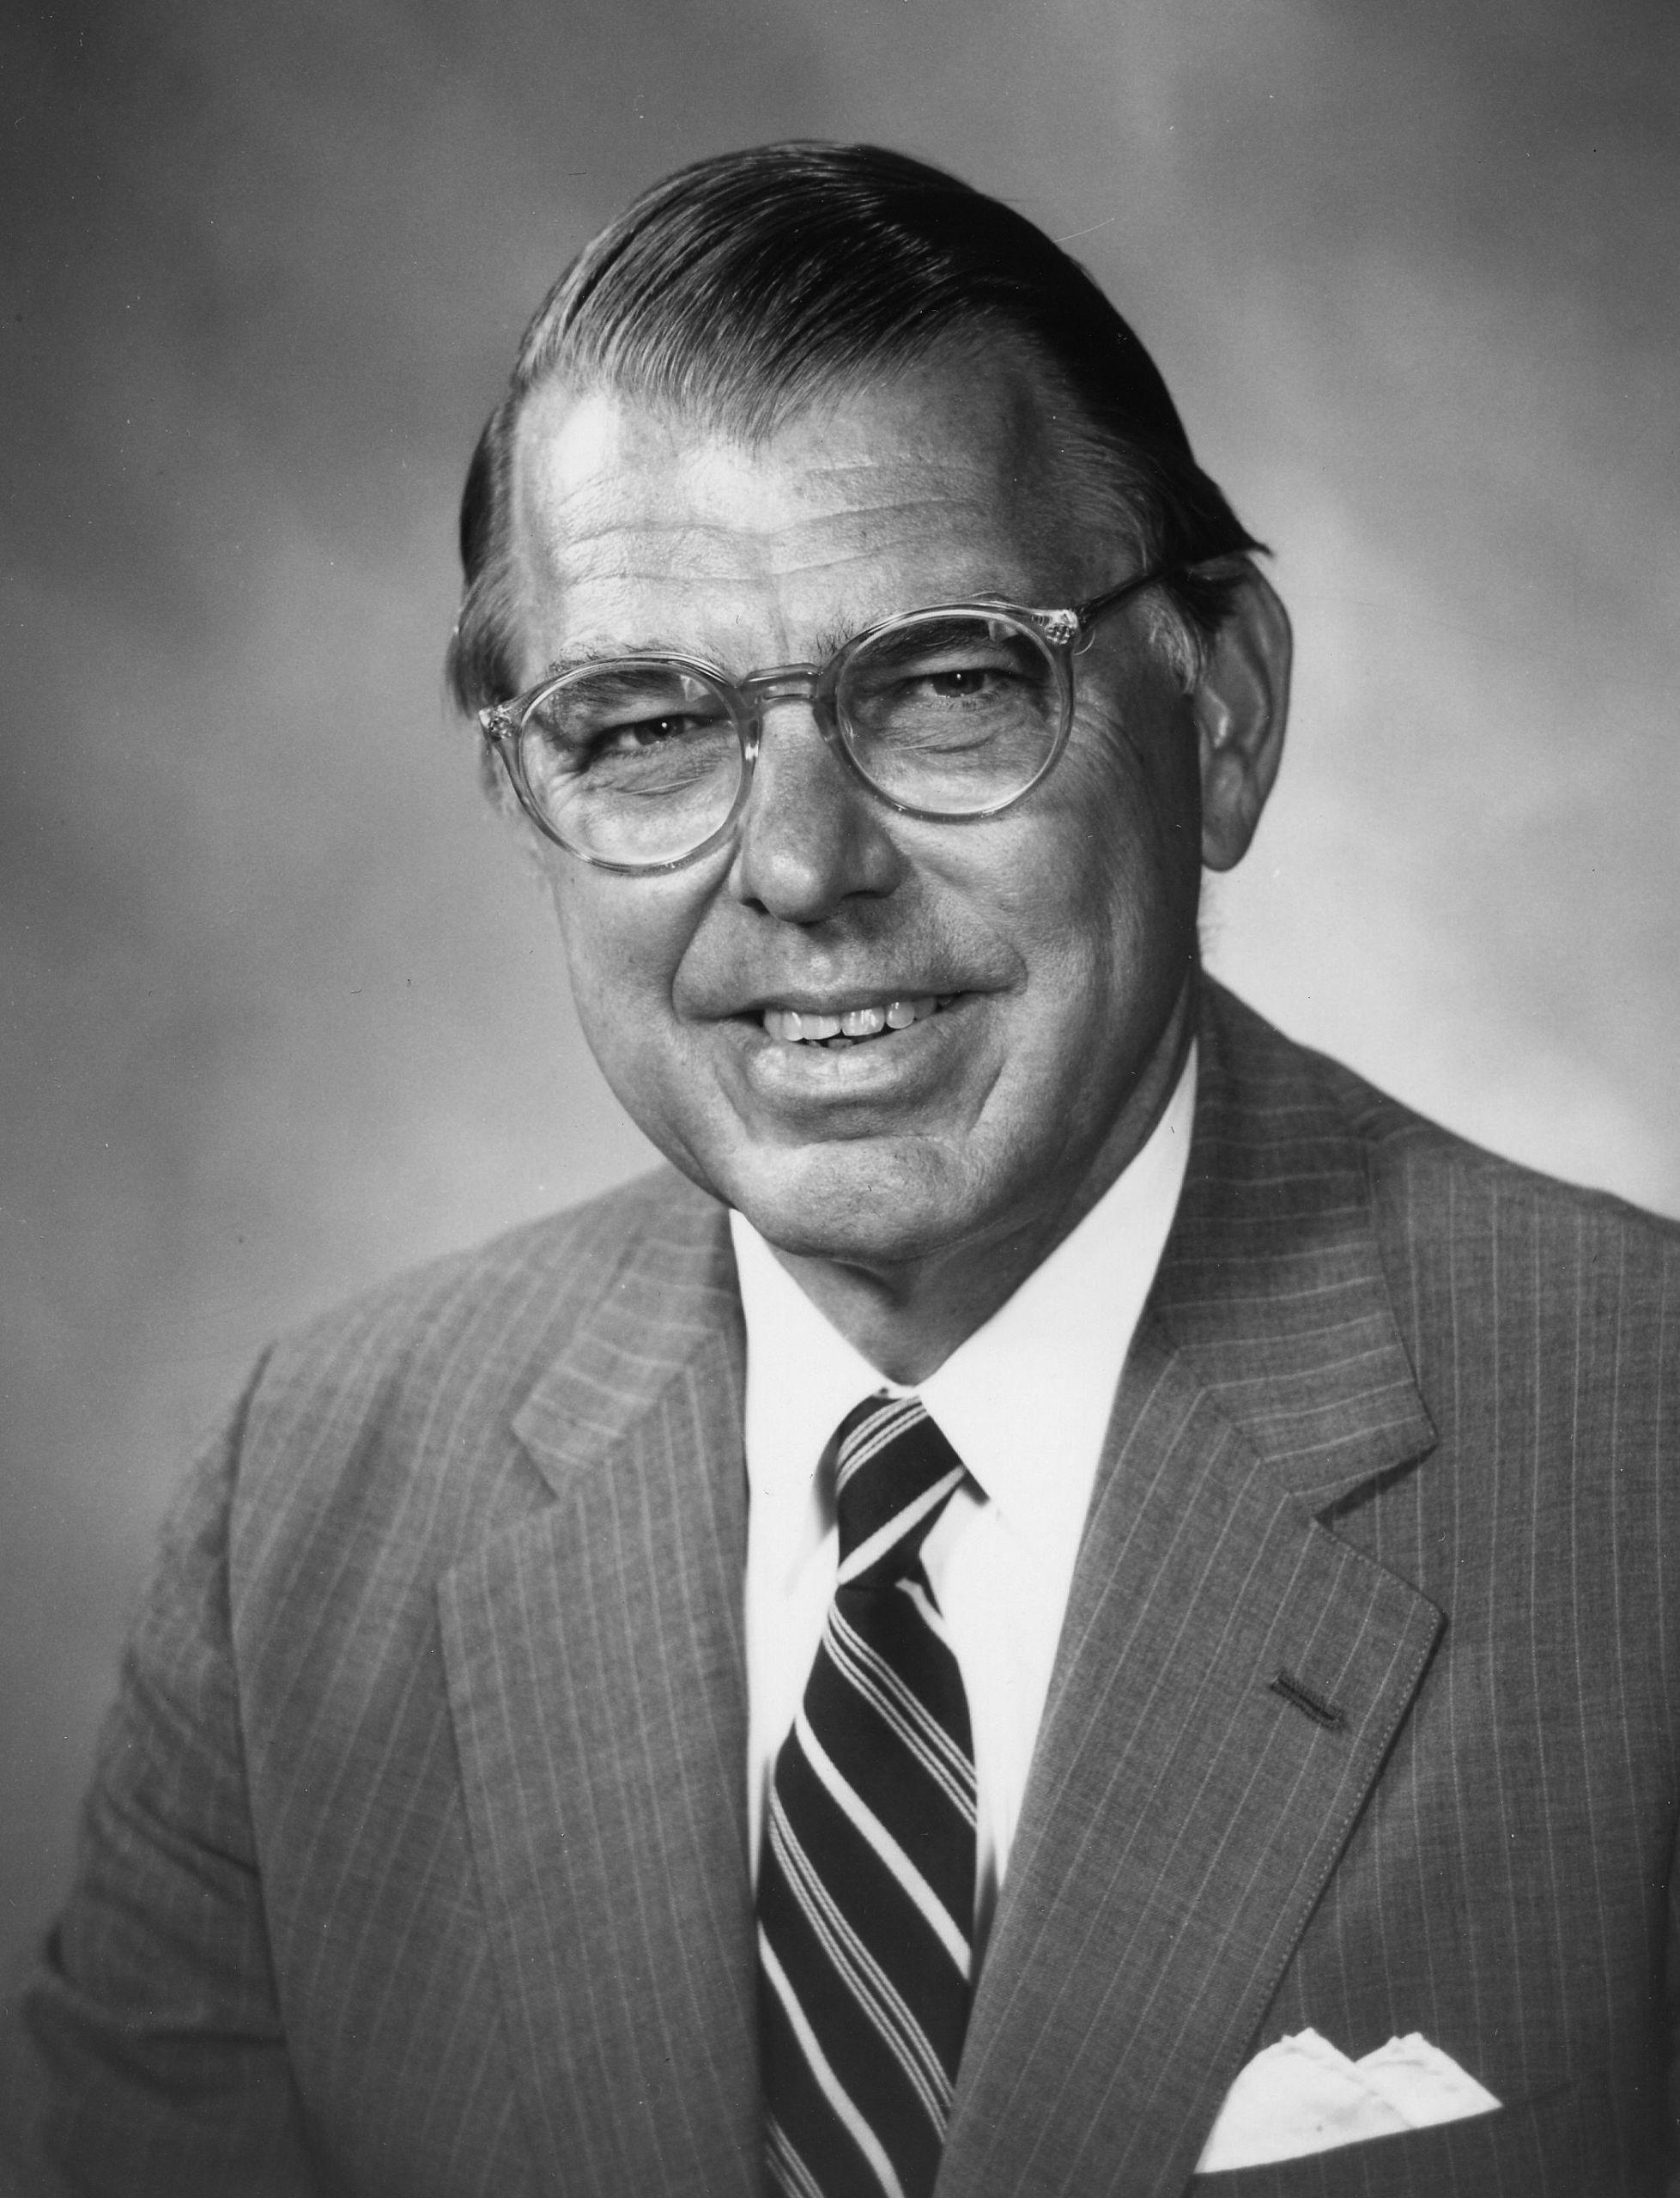 C.D. Spangler, Jr